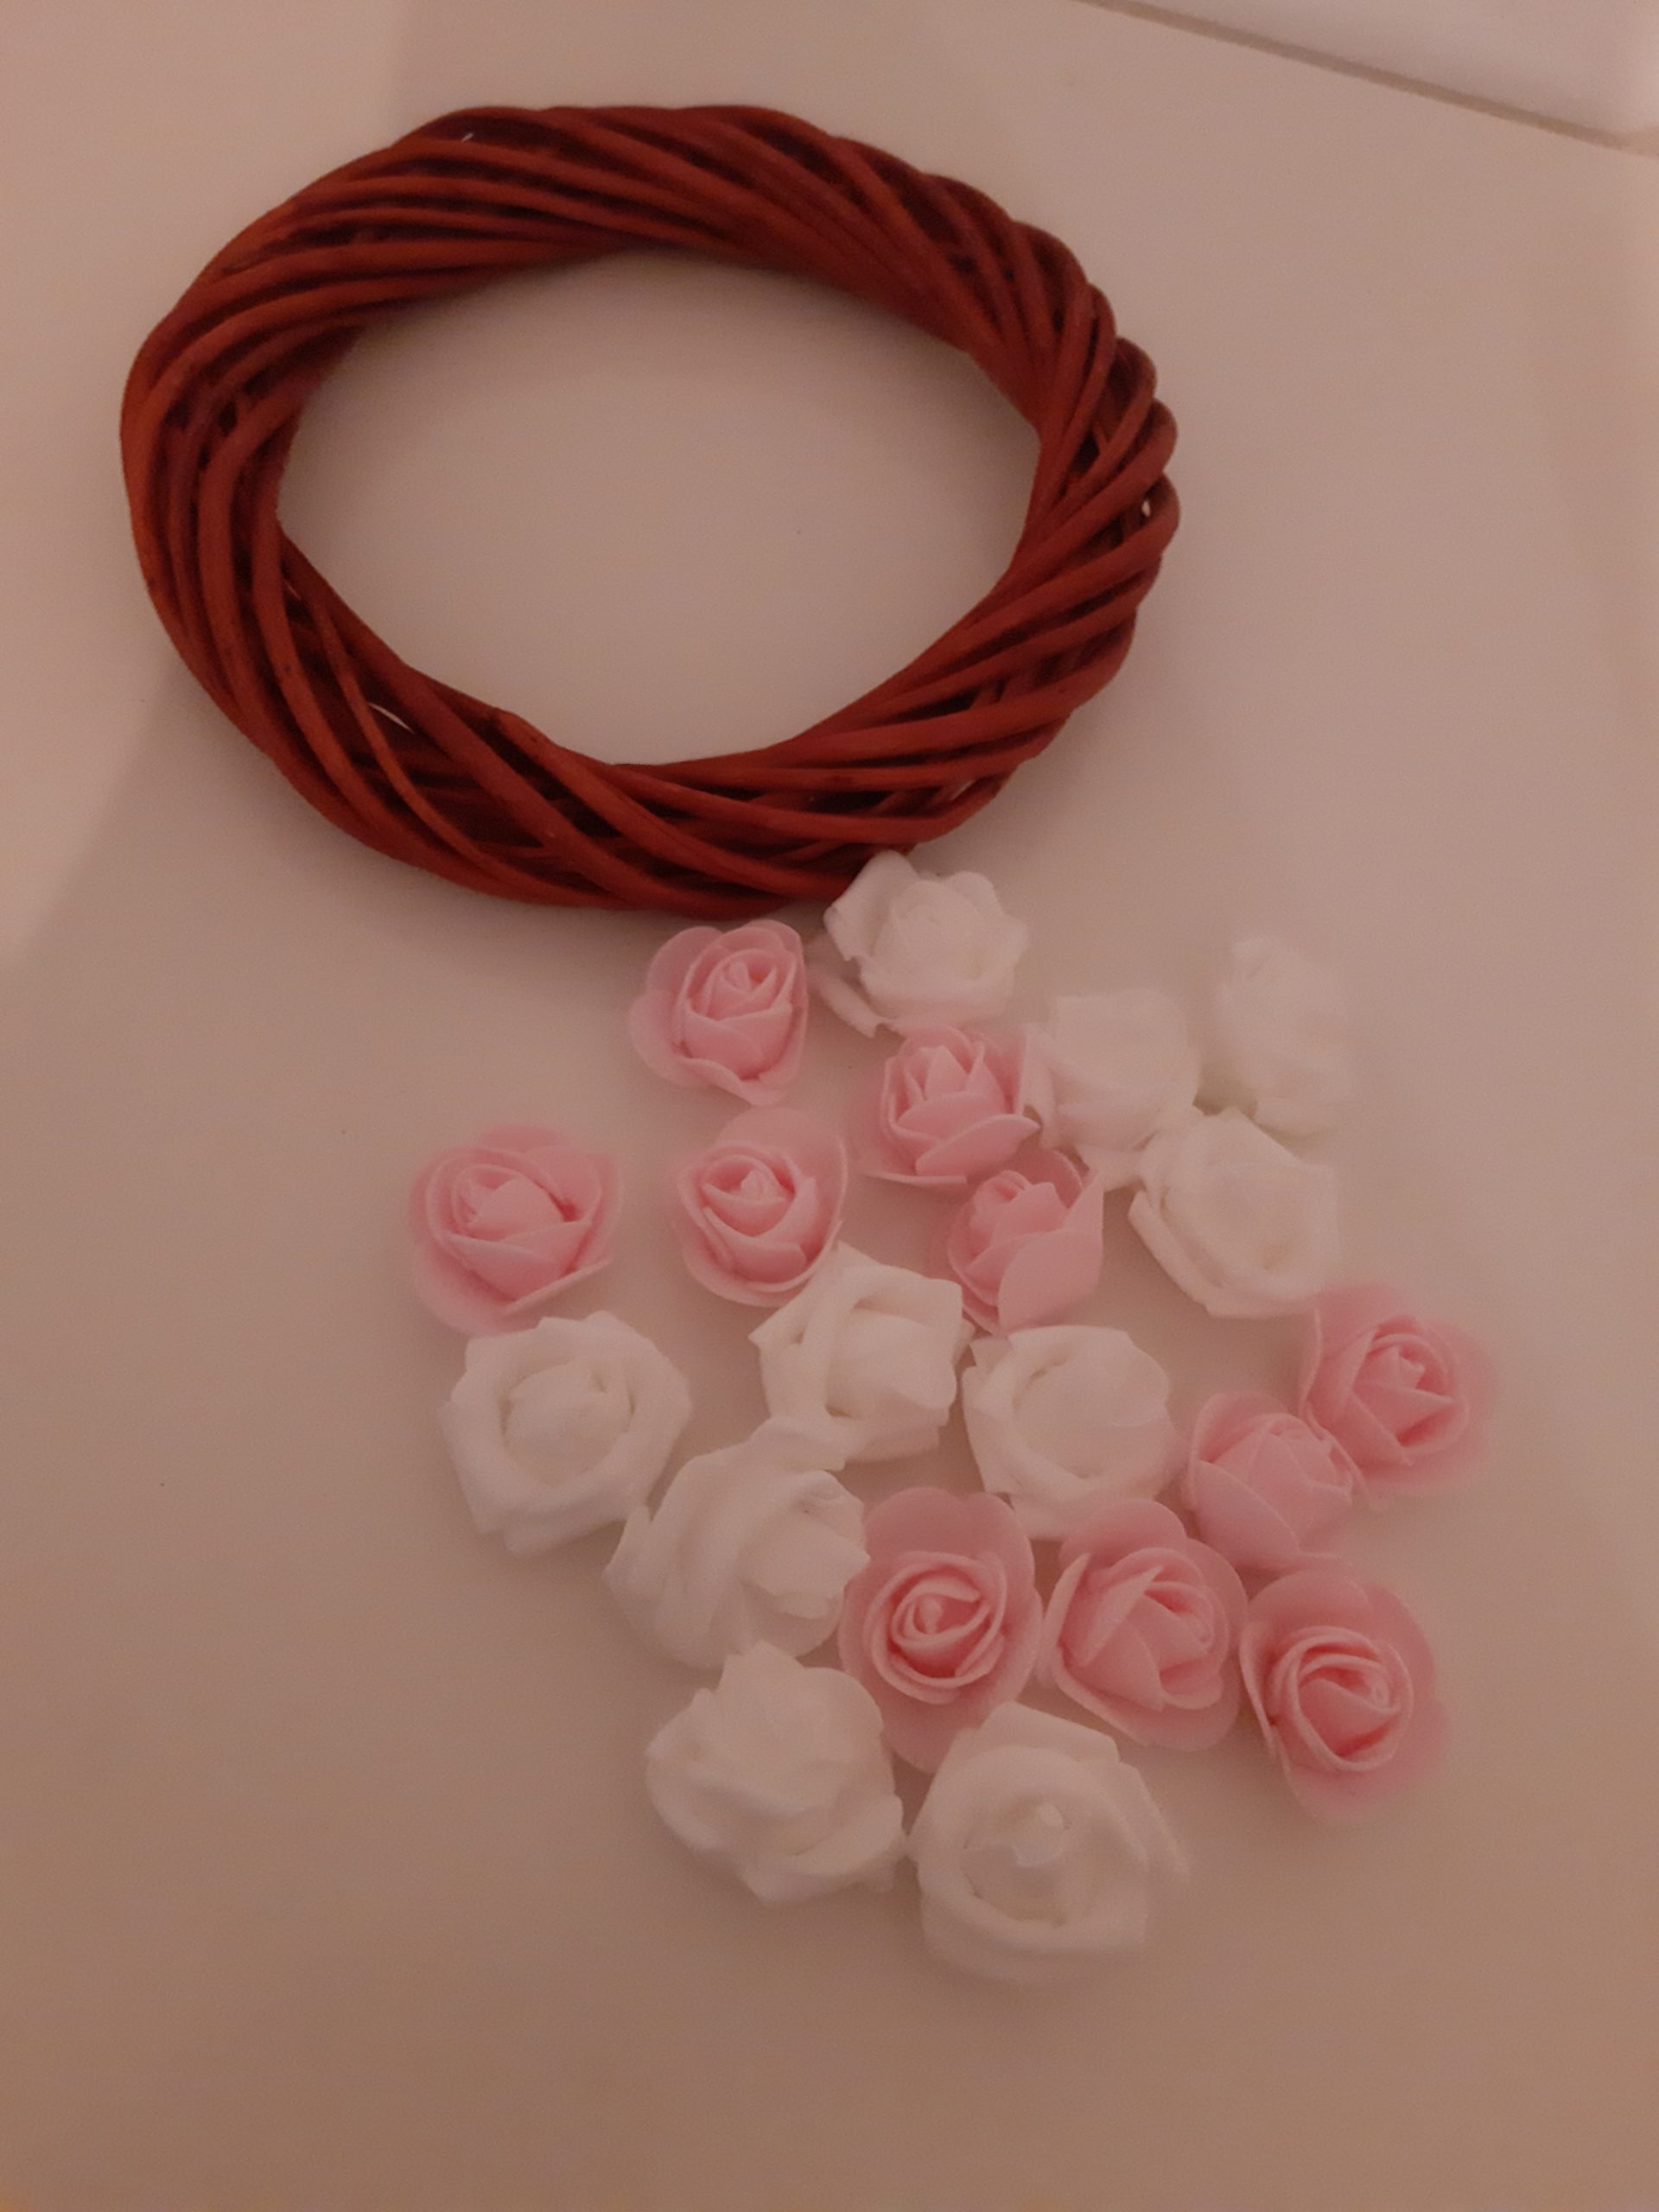 Vörös koszú és virágok